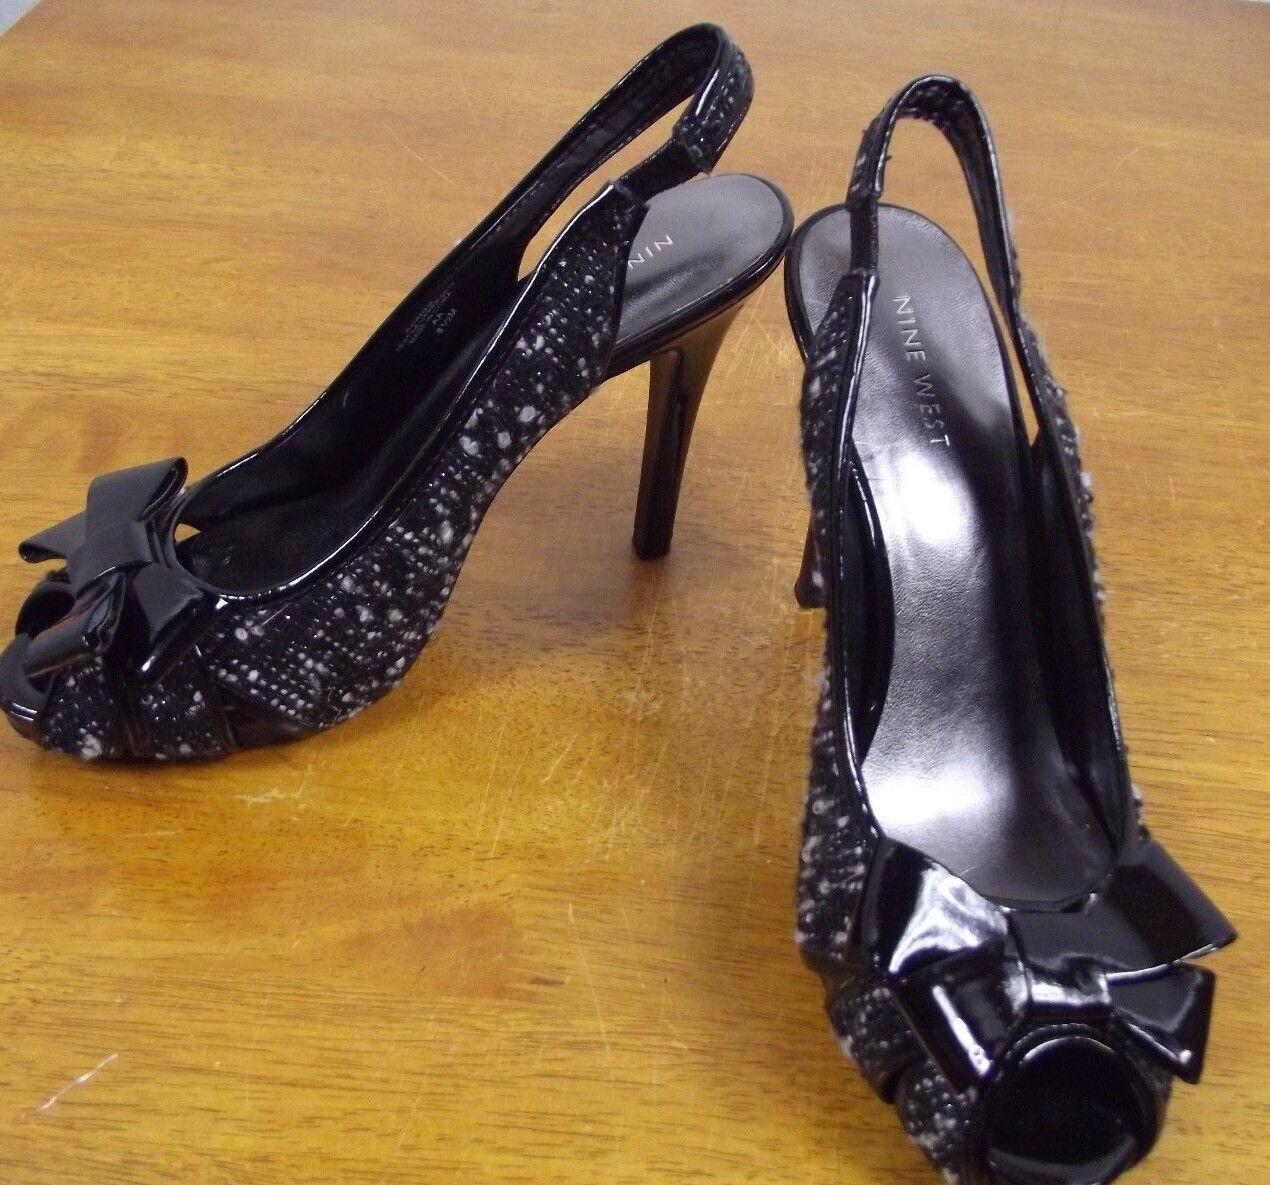 Nine West Womens 8.5 M Black Slingback Tweed Bow Peep Toe Slingback Black Pumps Heels Shoes 375188